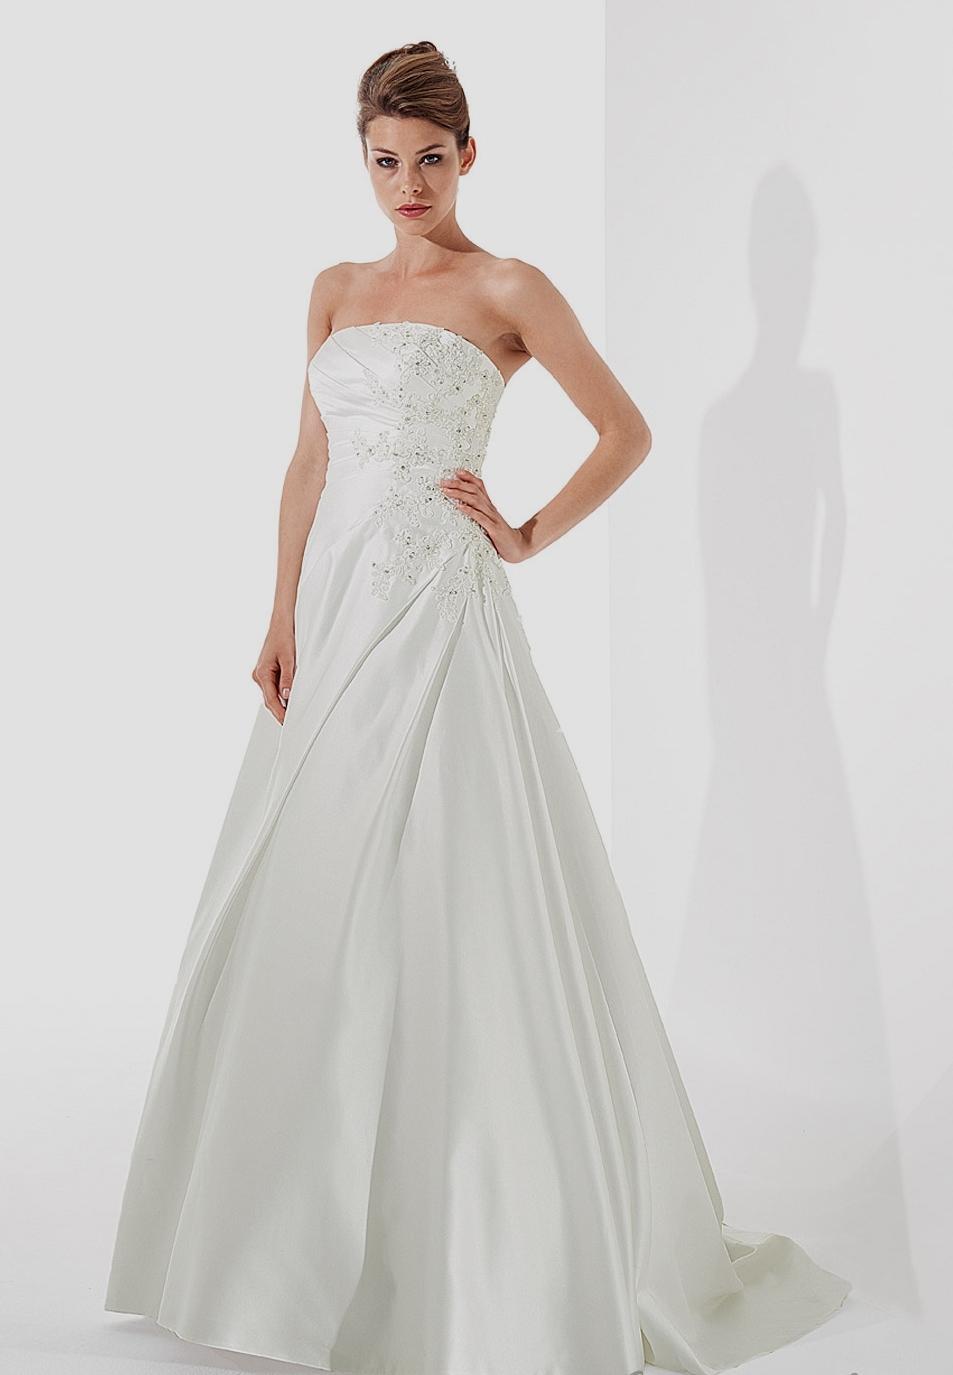 Hochzeitskleid Jasmin 303 - Typ: Brautkleid Jasmin 303